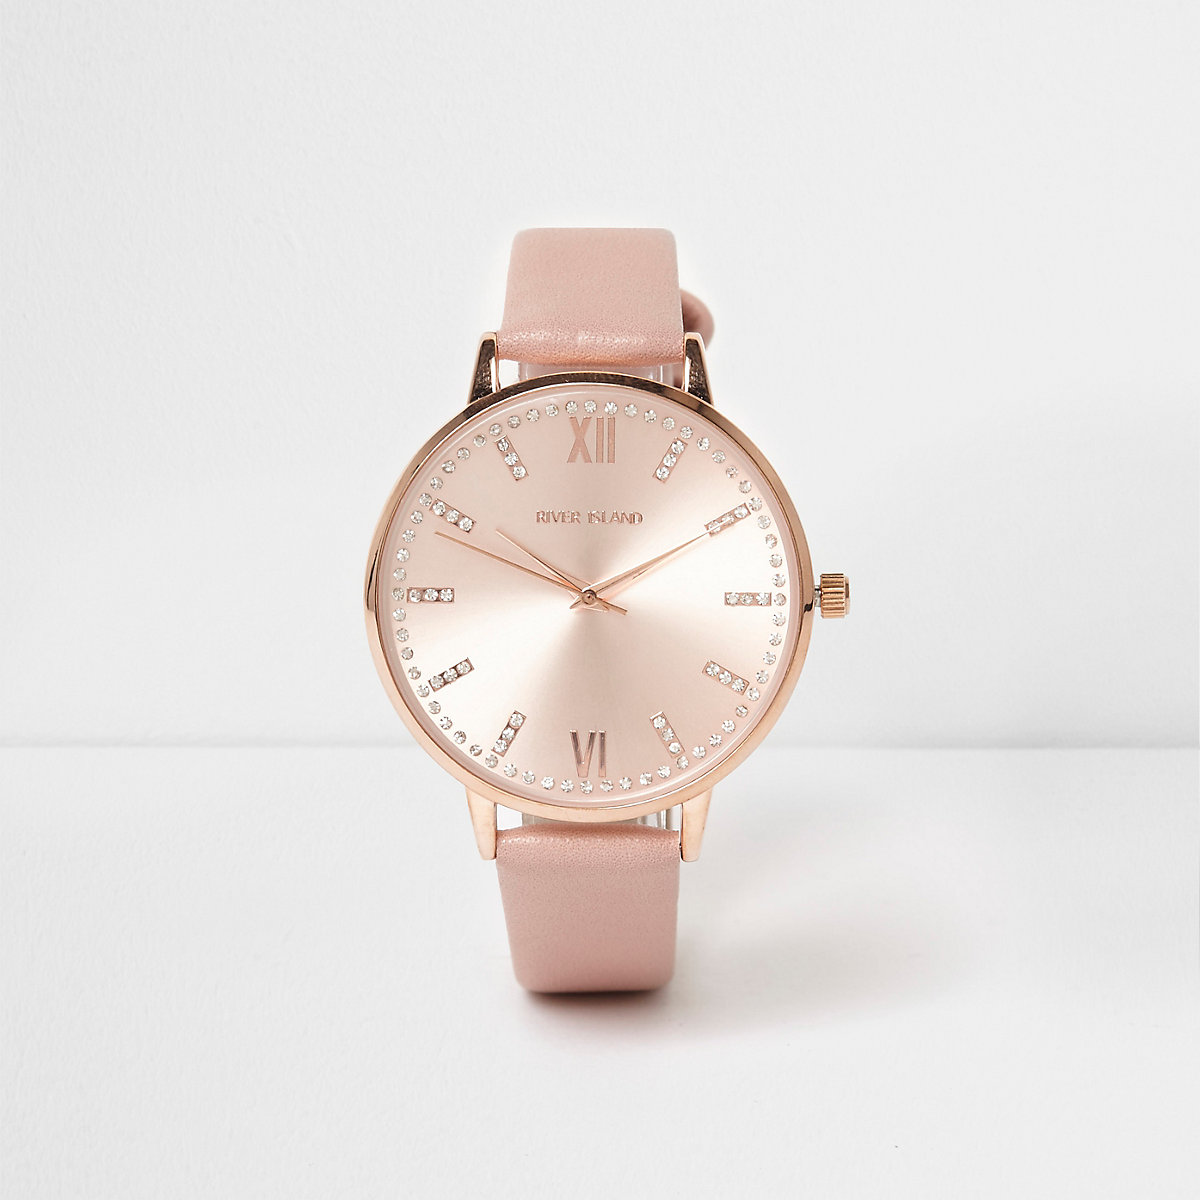 Pink rose gold tone round watch